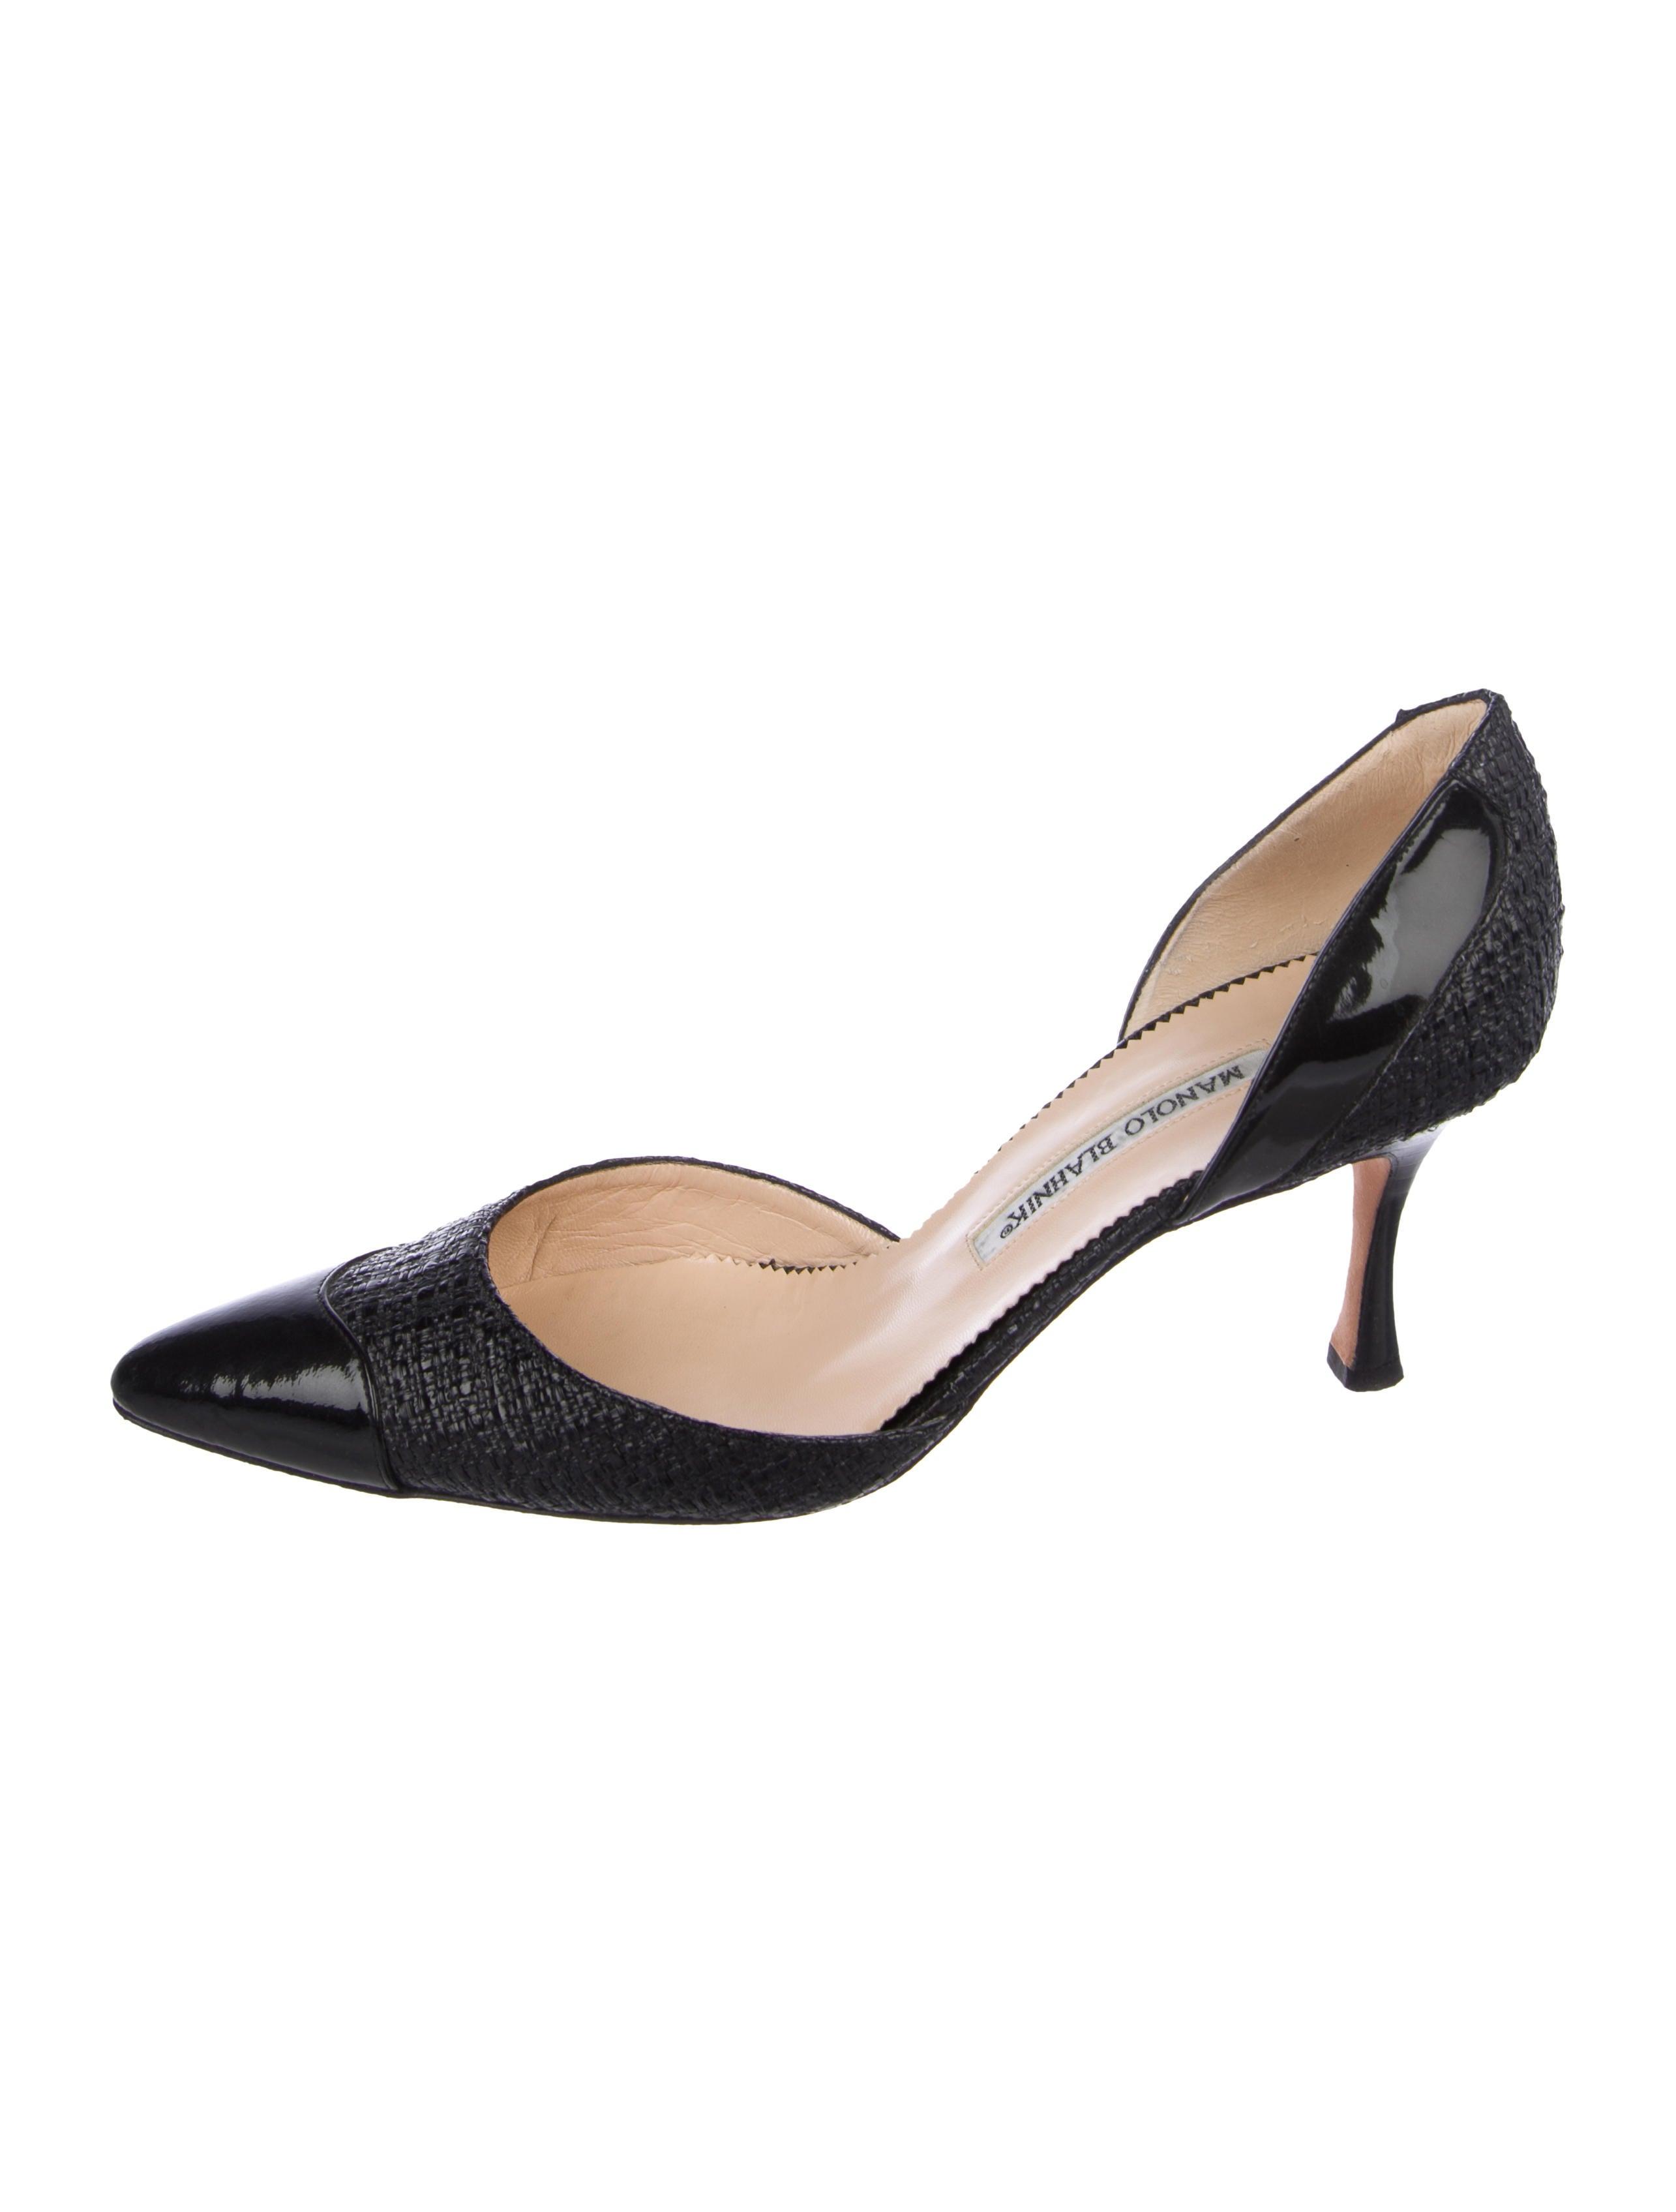 b869cffb9dd24 Manolo Blahnik Woven d'Orsay Pumps - Shoes - MOO88953 | The RealReal